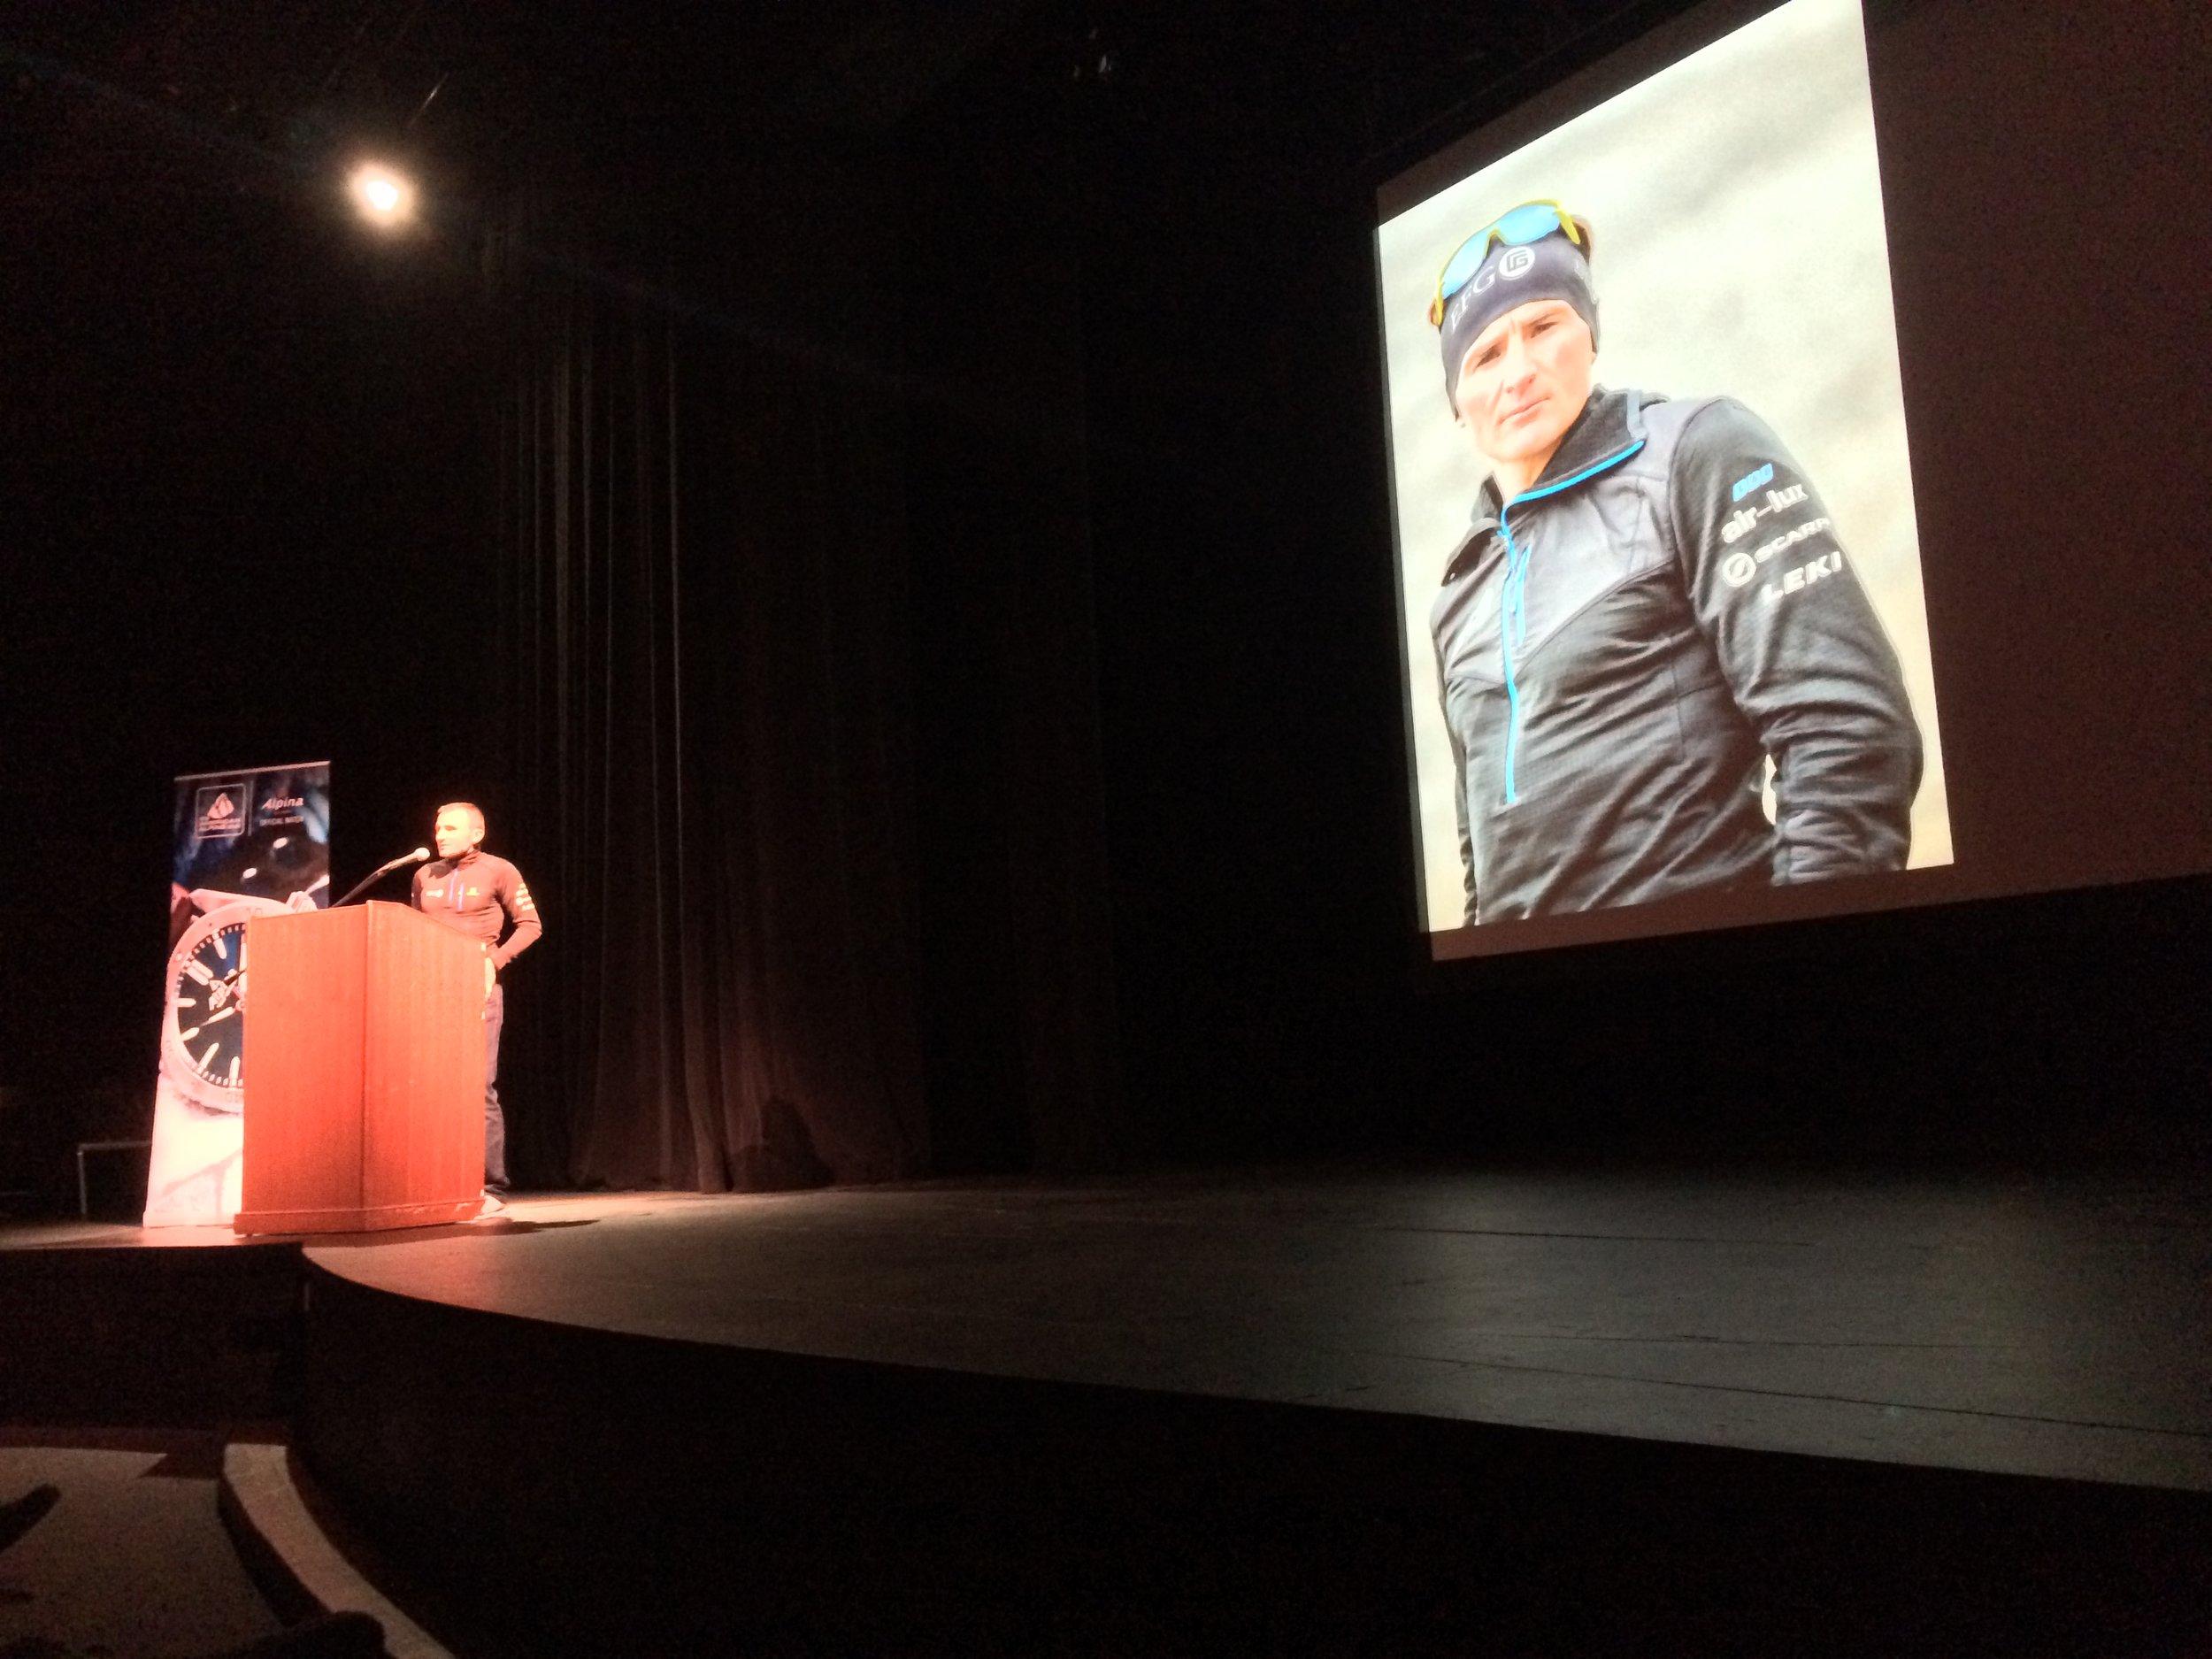 Ueli Steck, speaking during the American Alpine Club 2016 Athlete Tour